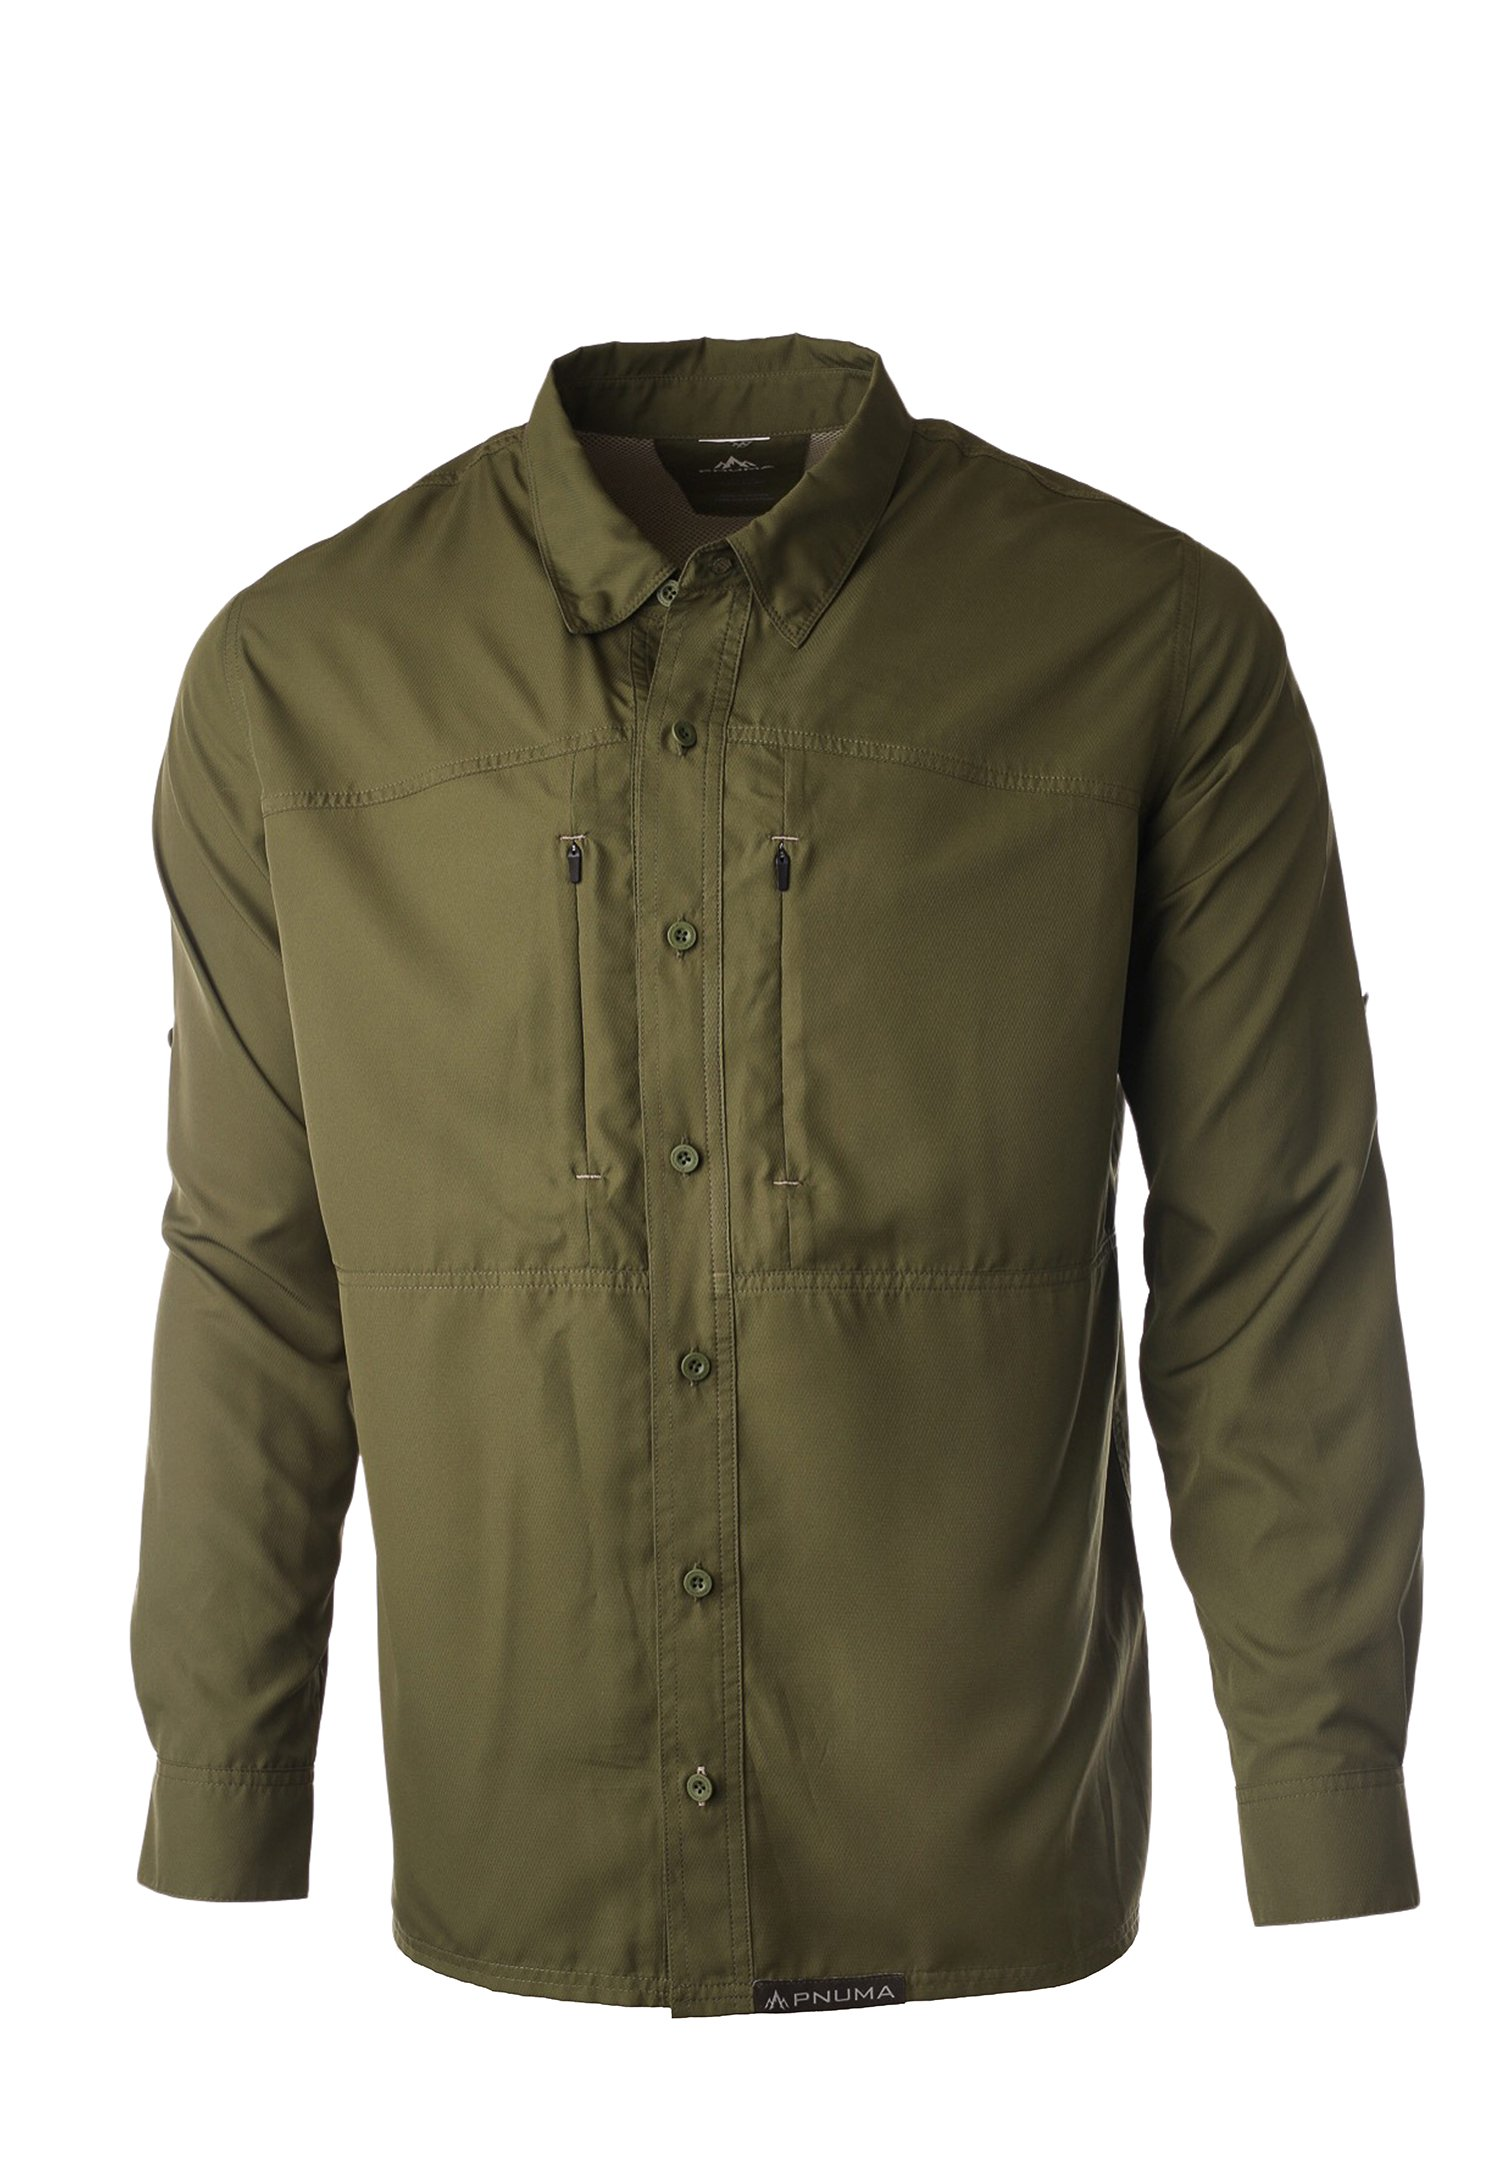 Shooting Shirt - Long Sleeve - Solid